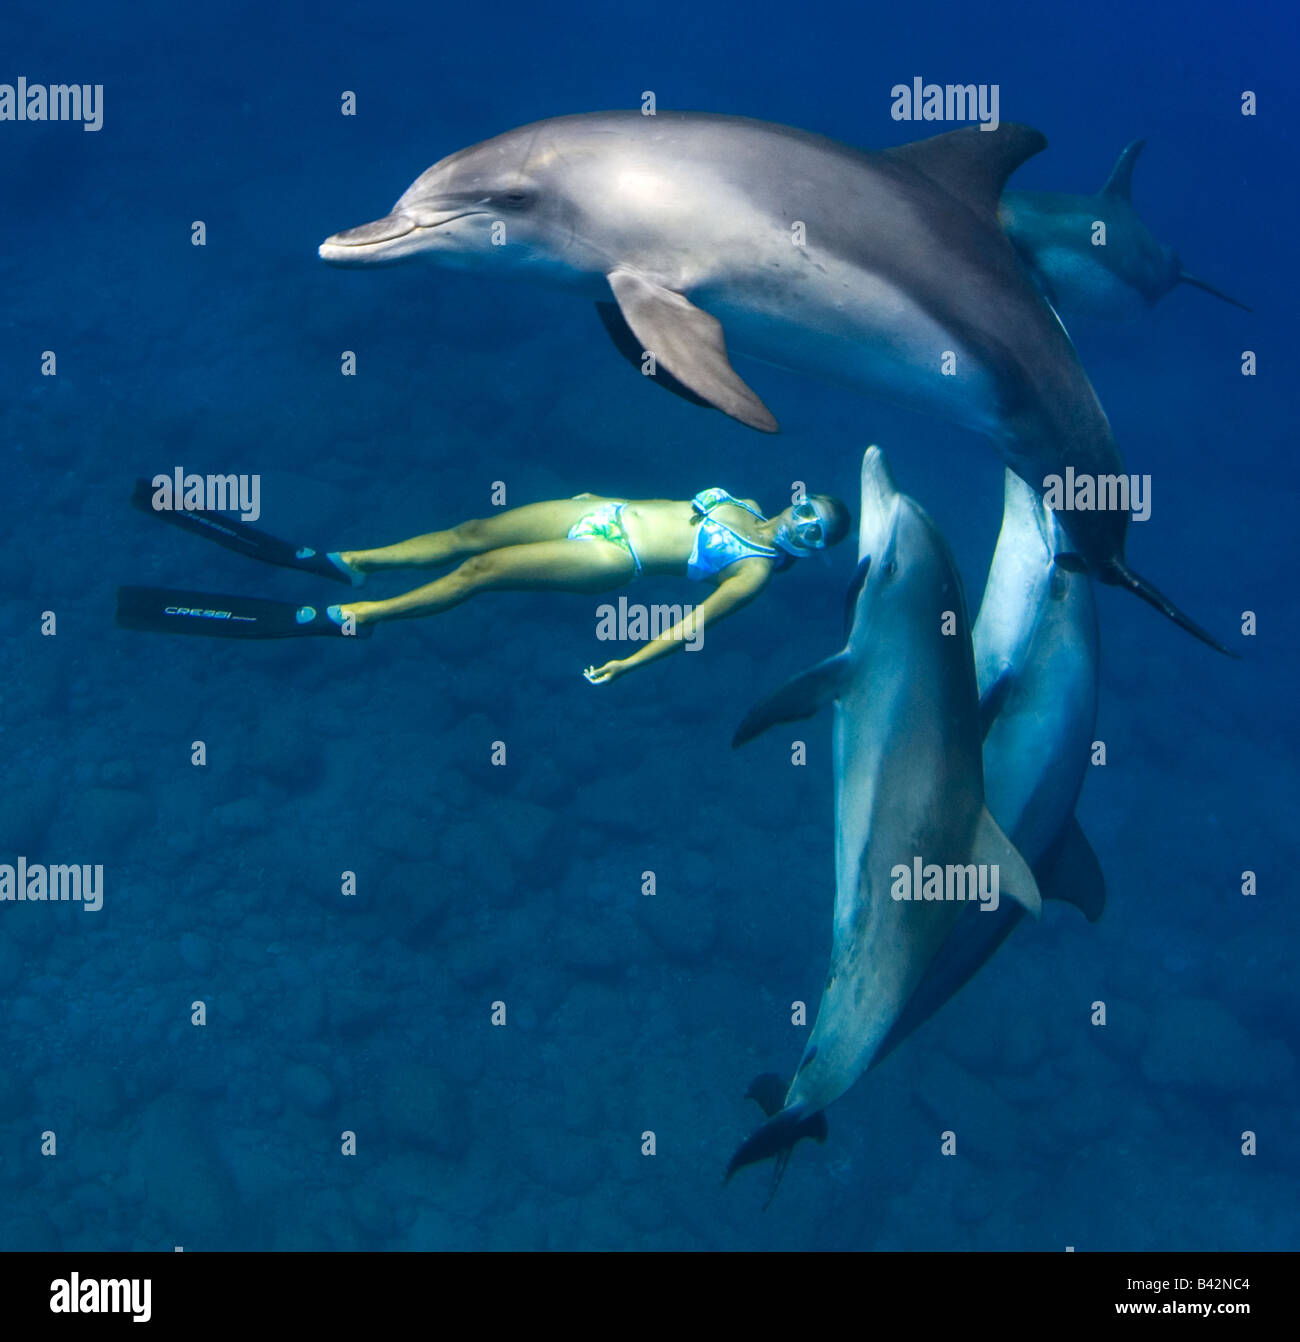 Indo Pacific Bottlenose Dolphins and Freediver Tursiops aduncus Mukojima Group Ogasawara Islands Pacific Ocean Japan - Stock Image